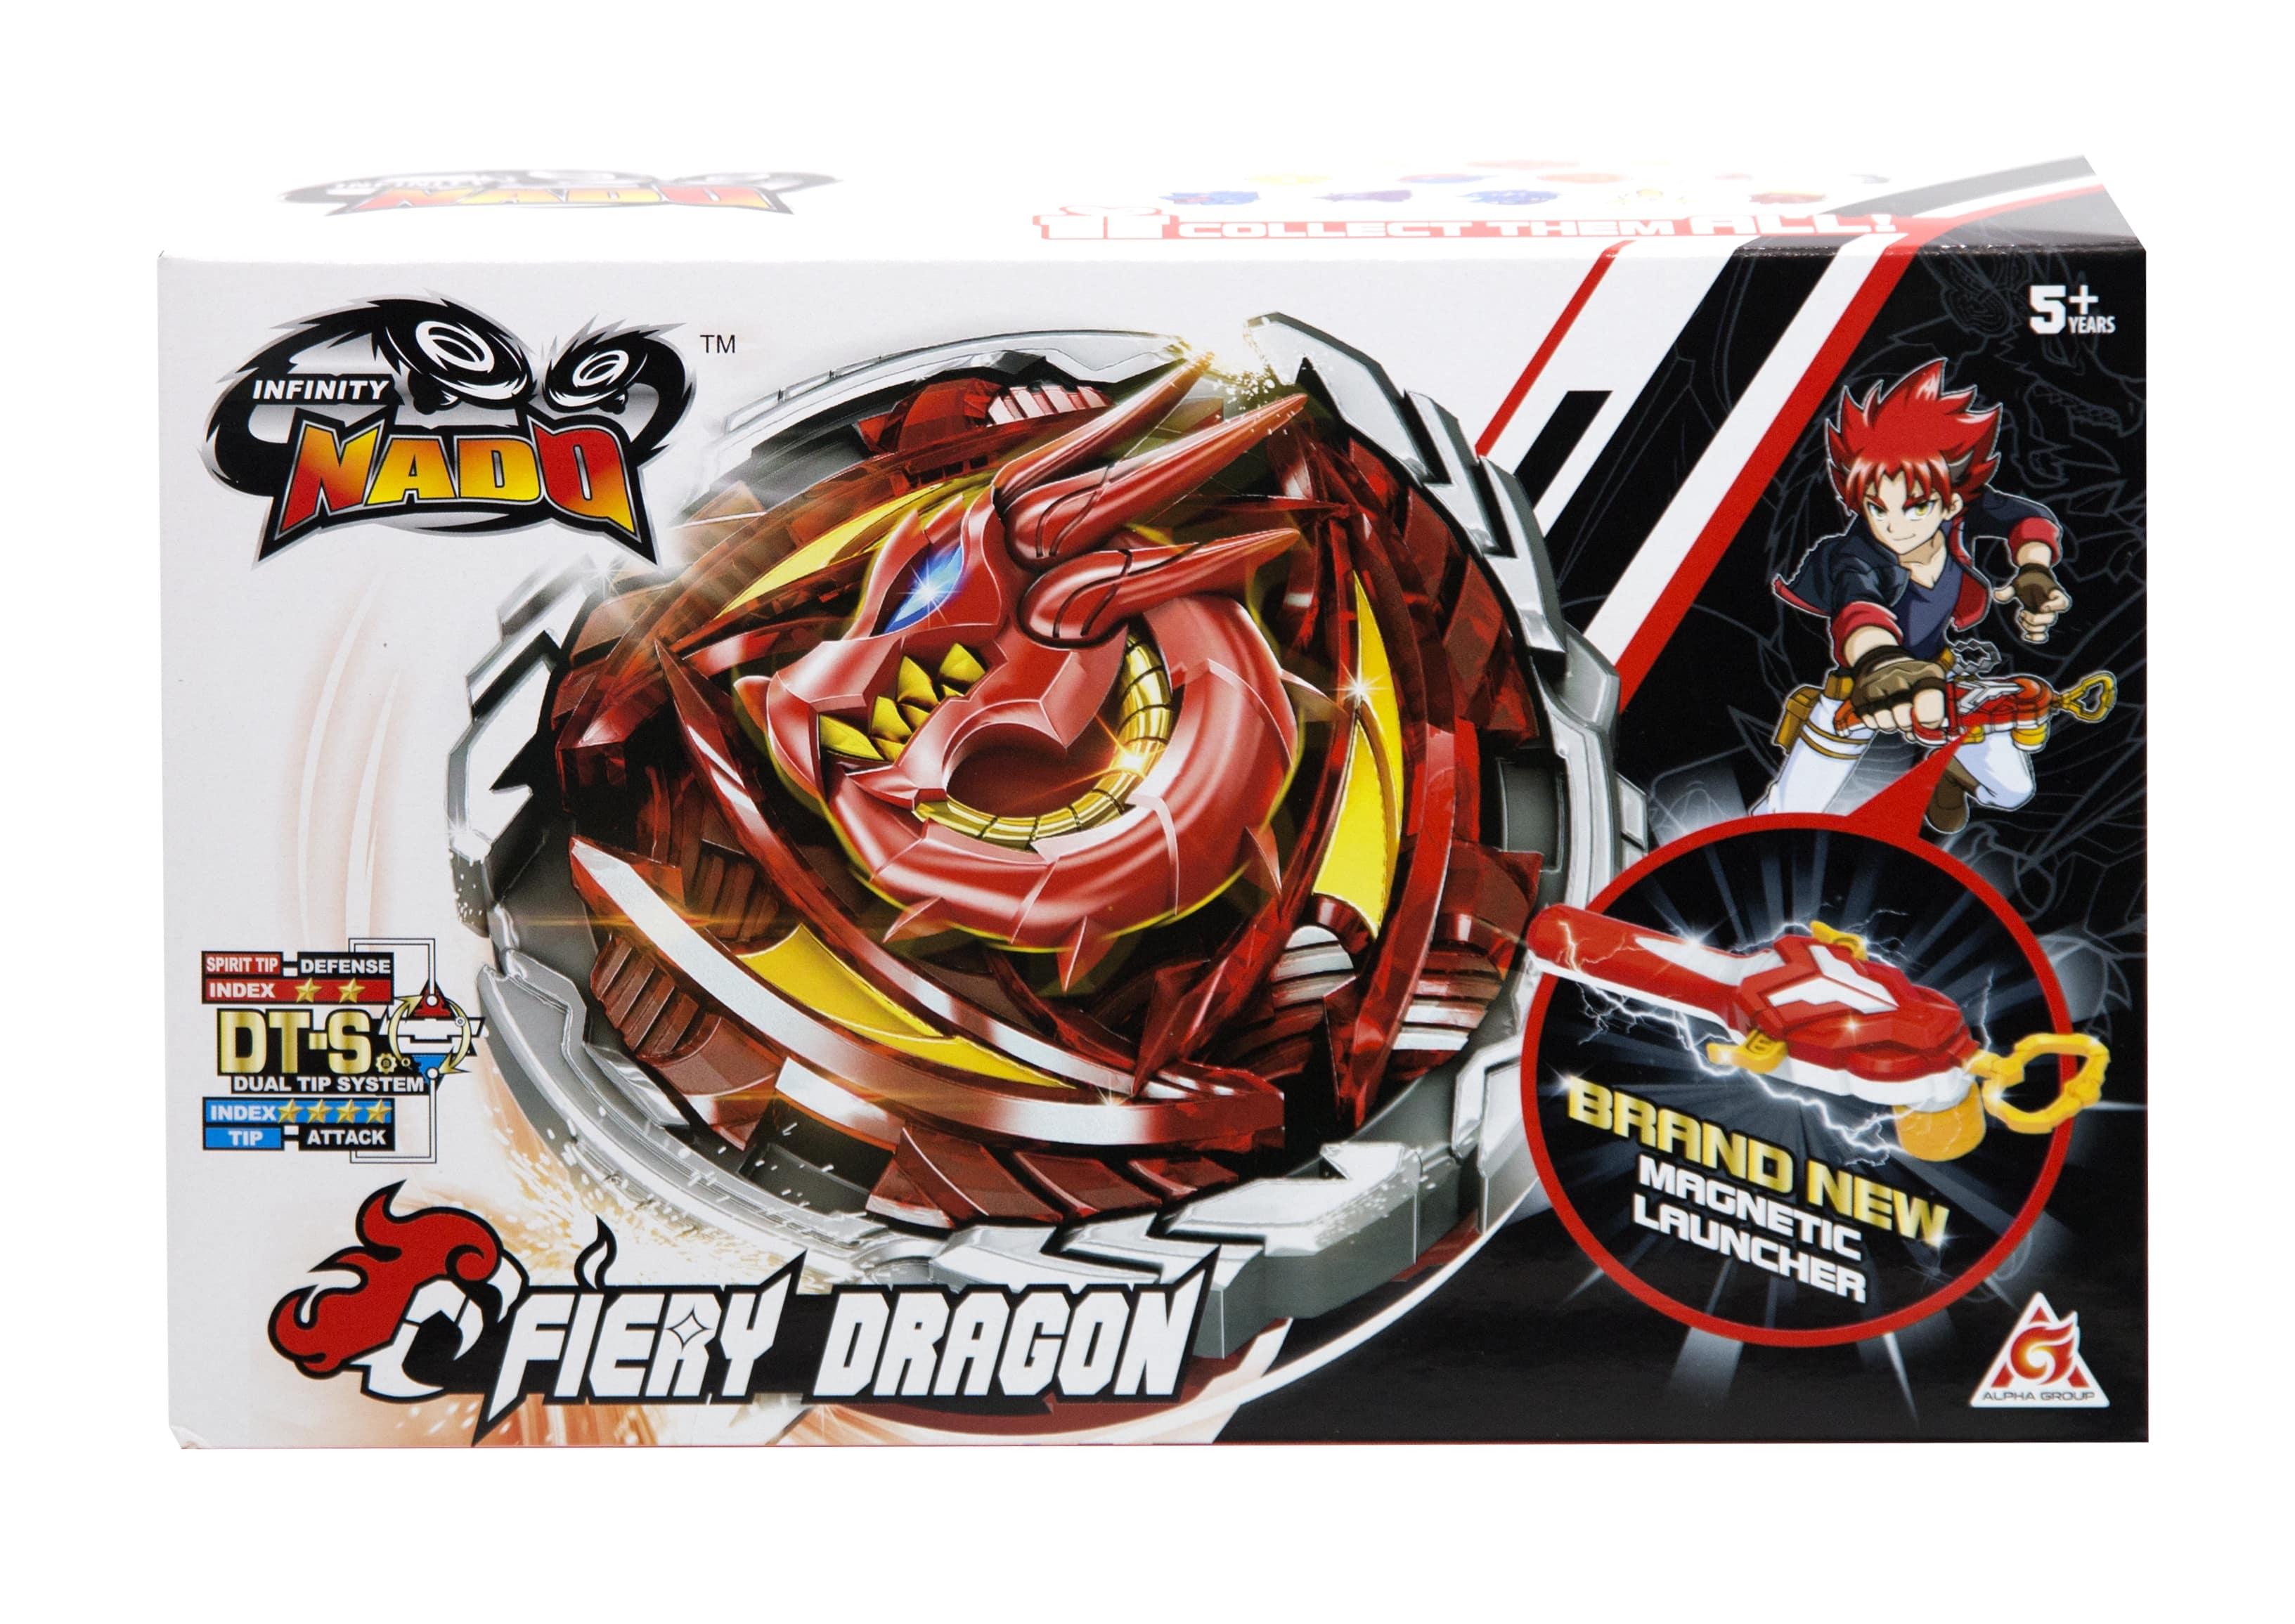 Infinity Nado Дзиґа Infinity Nado V серія Original Fiery Dragon Вогняний Дракон